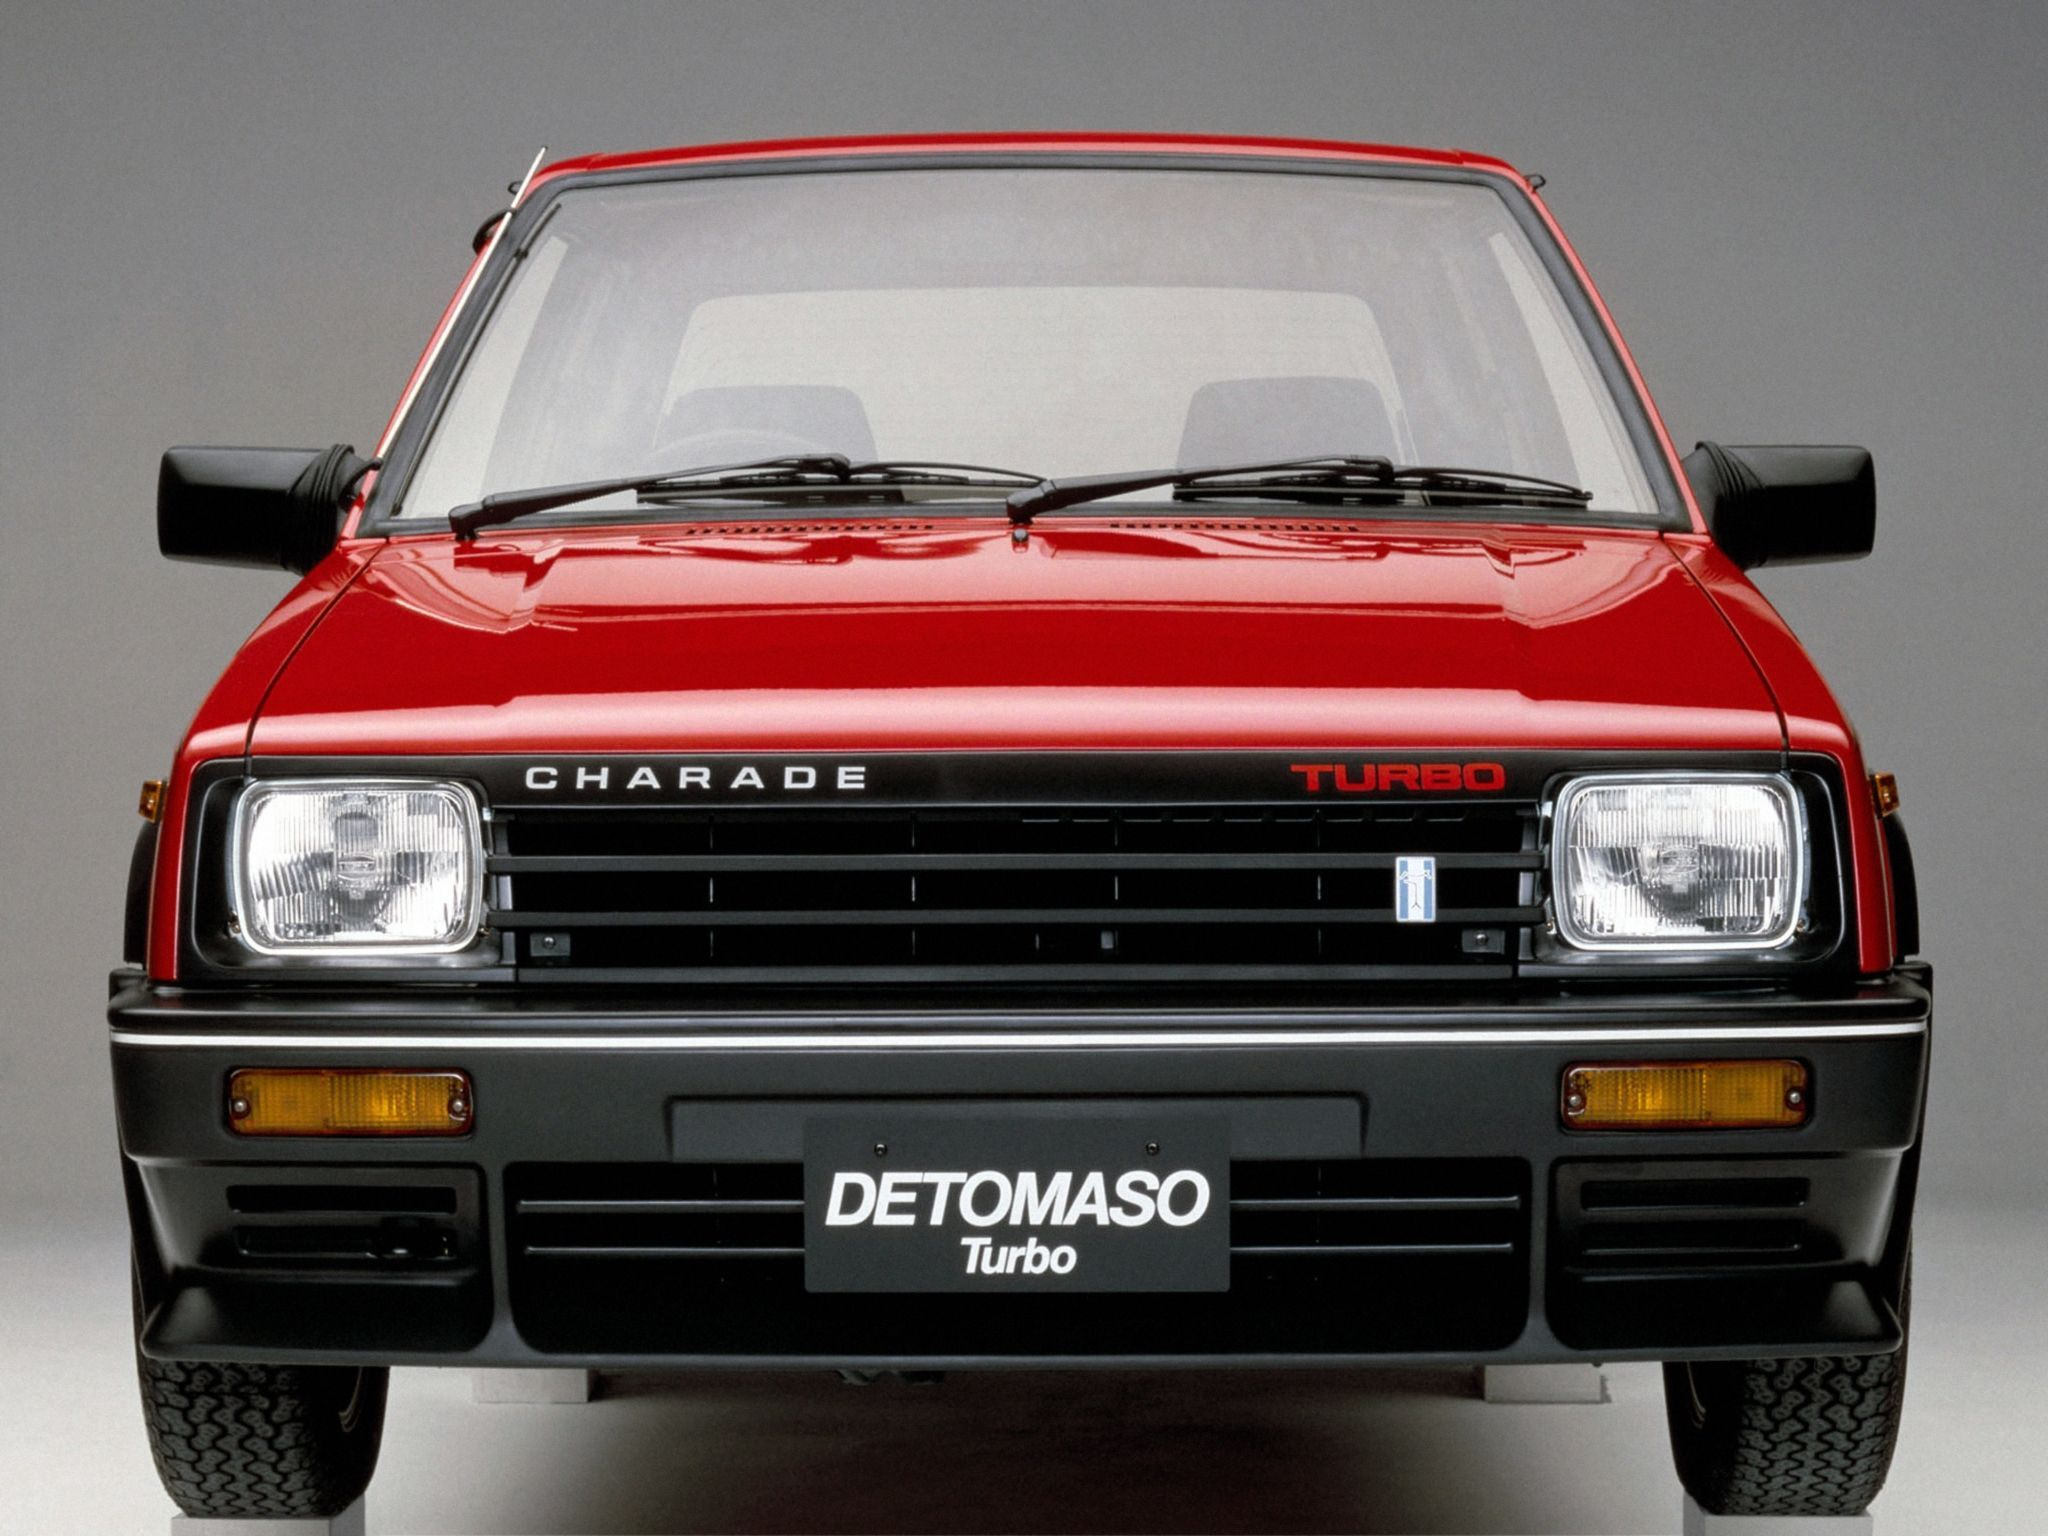 Daihatsu Charade Detomaso Turbo Dengan Gambar Mobil